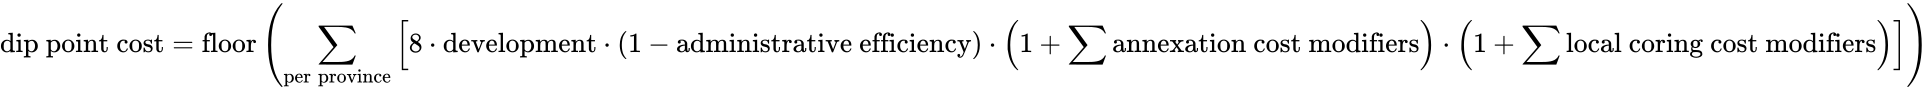 \text{dip point cost} = \text{floor}\left( \sum_\text{per province}\left[ 8 \cdot \text{development} \cdot (1 - \text{administrative efficiency}) \cdot \left(1 + \sum\text{annexation cost modifiers}\right) \cdot \left(1 + \sum\text{local coring cost modifiers}\right) \right] \right)